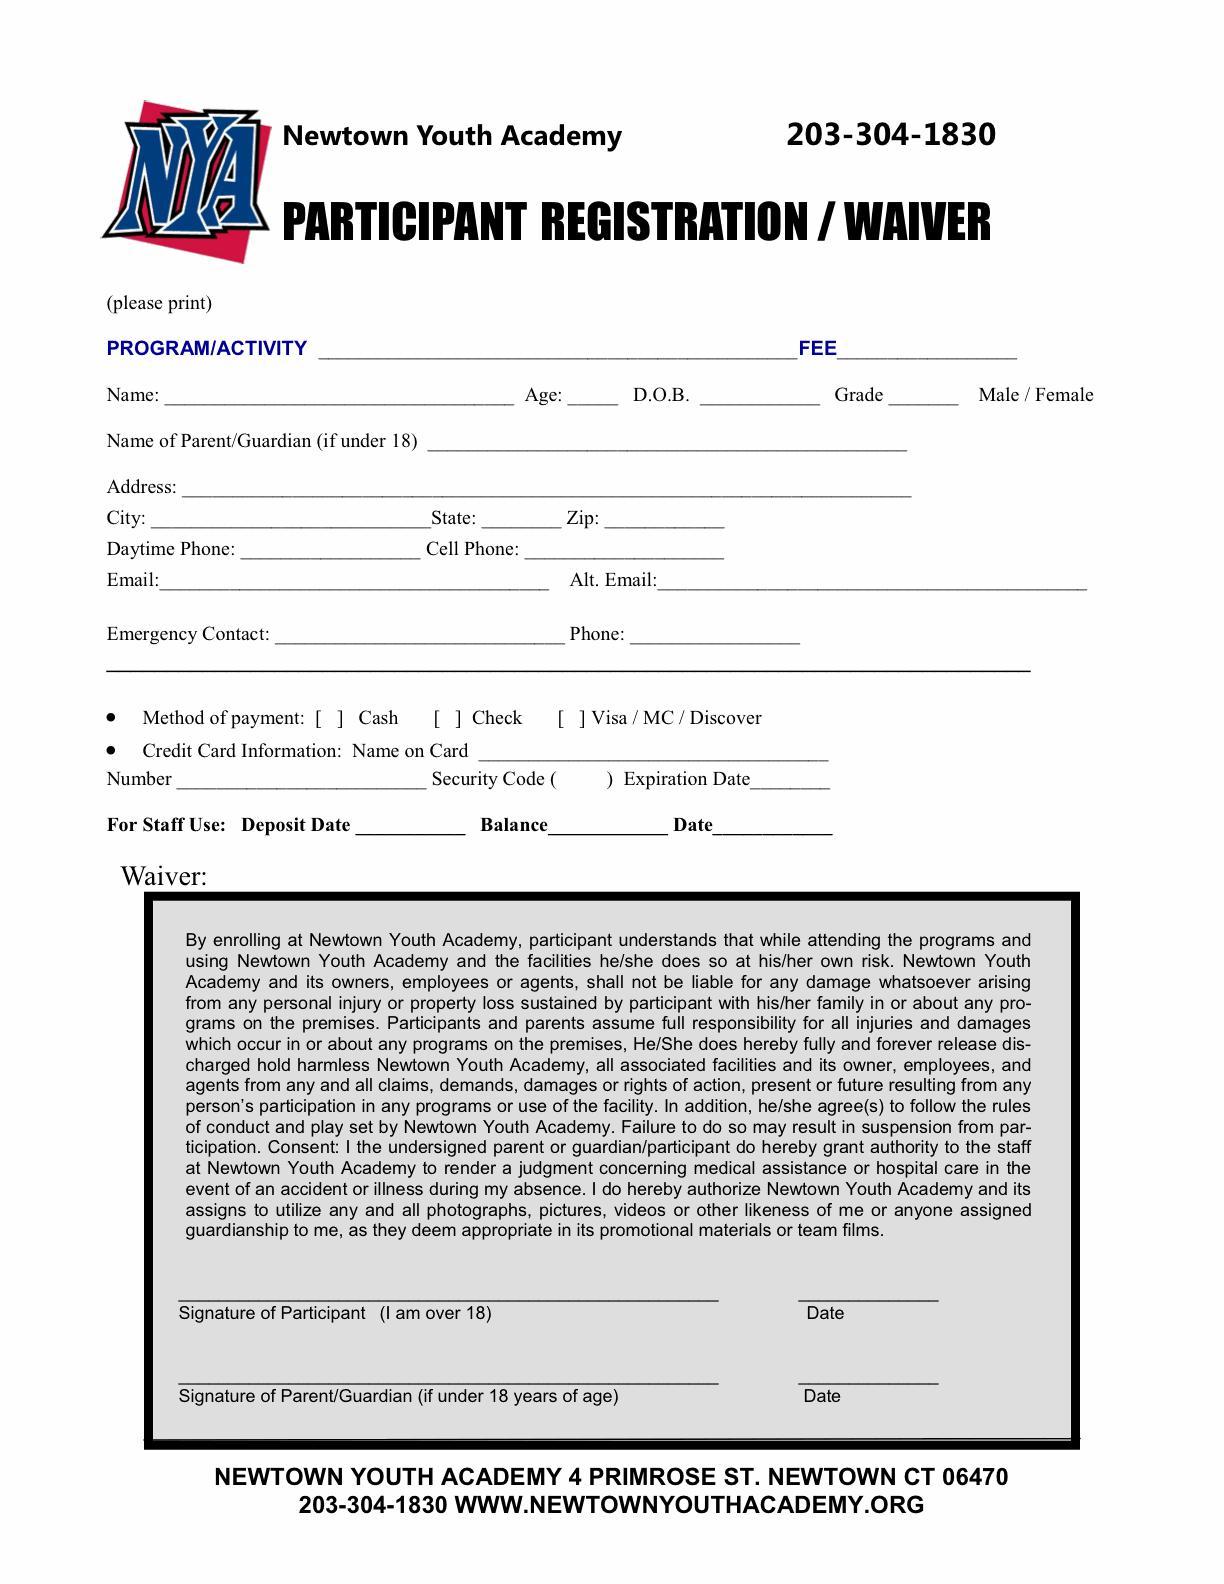 Baseball Player Registration Form Template